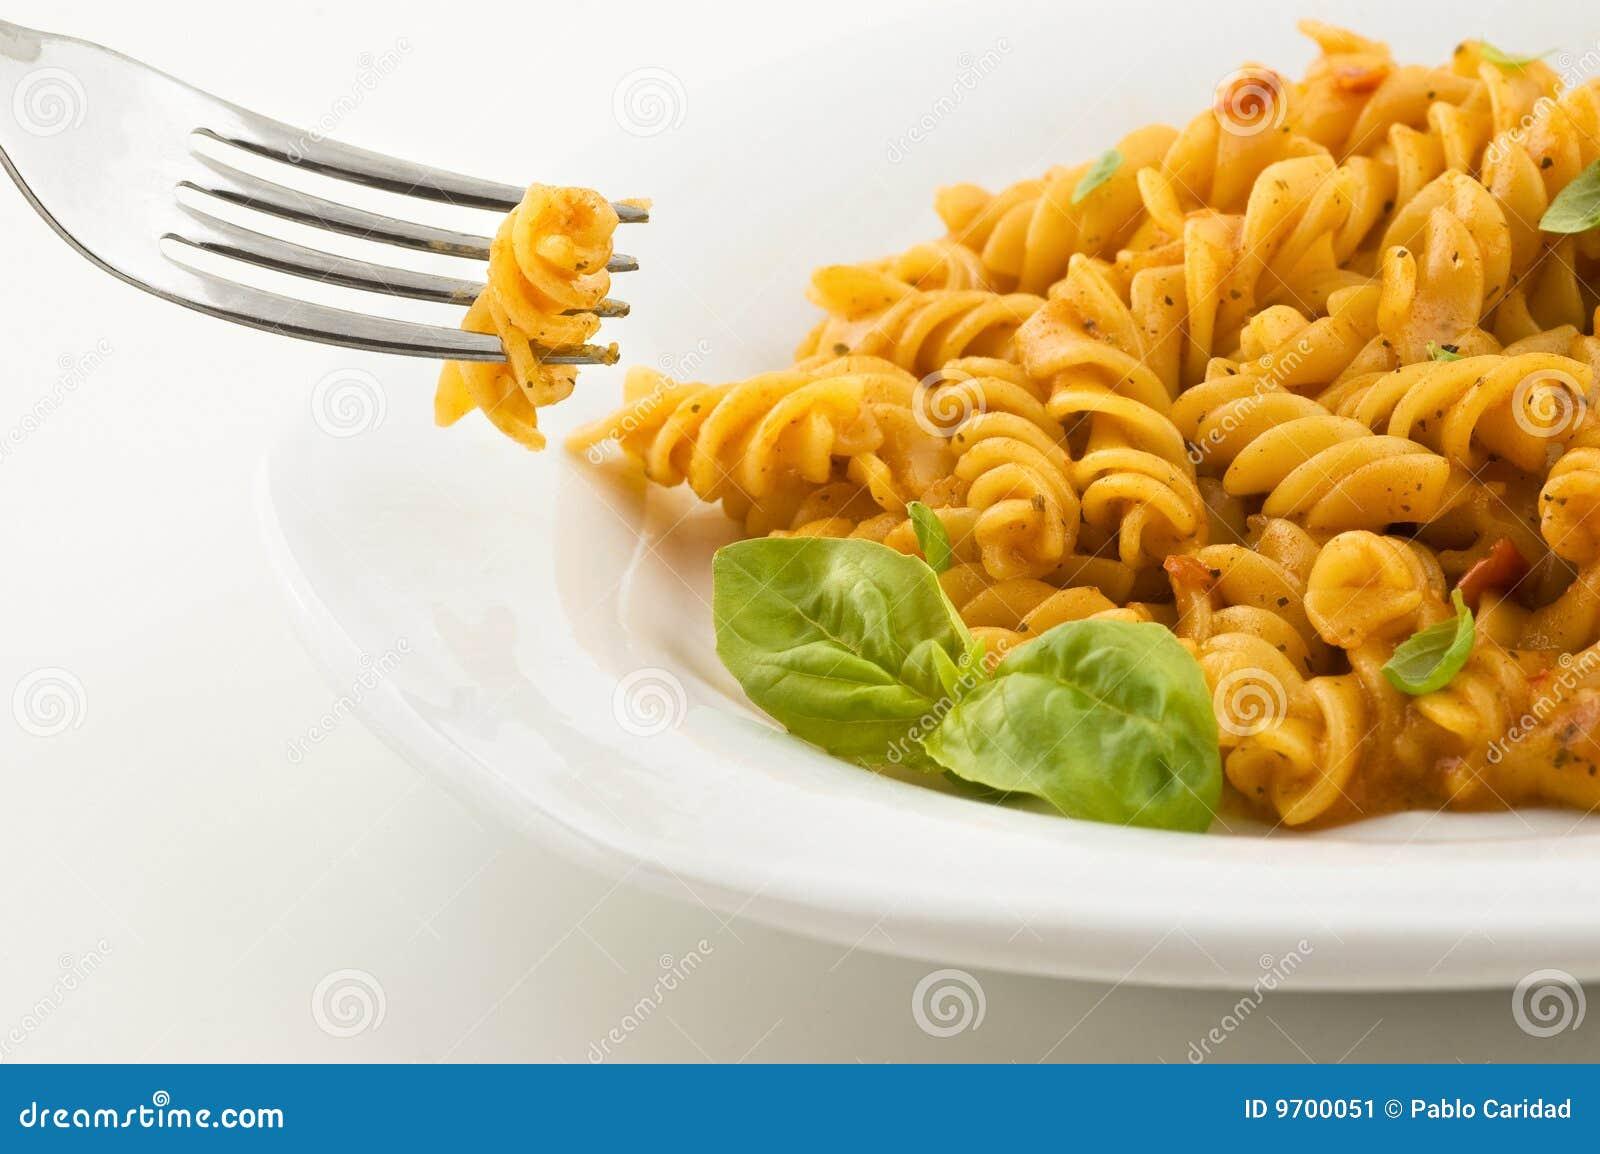 Fresh Italian Pasta With Tomato Sauce And Basil. Stock Image - Image ...